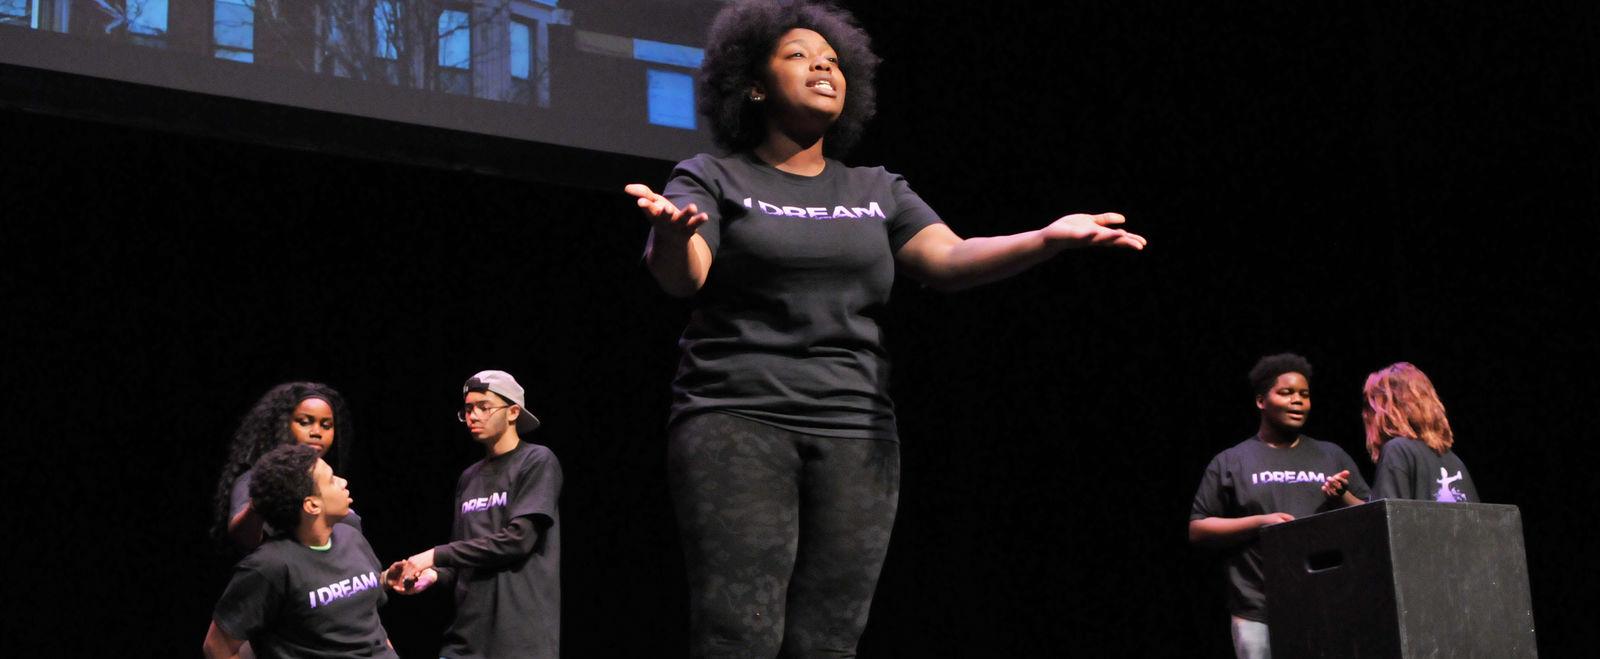 A woman speaks on stage.